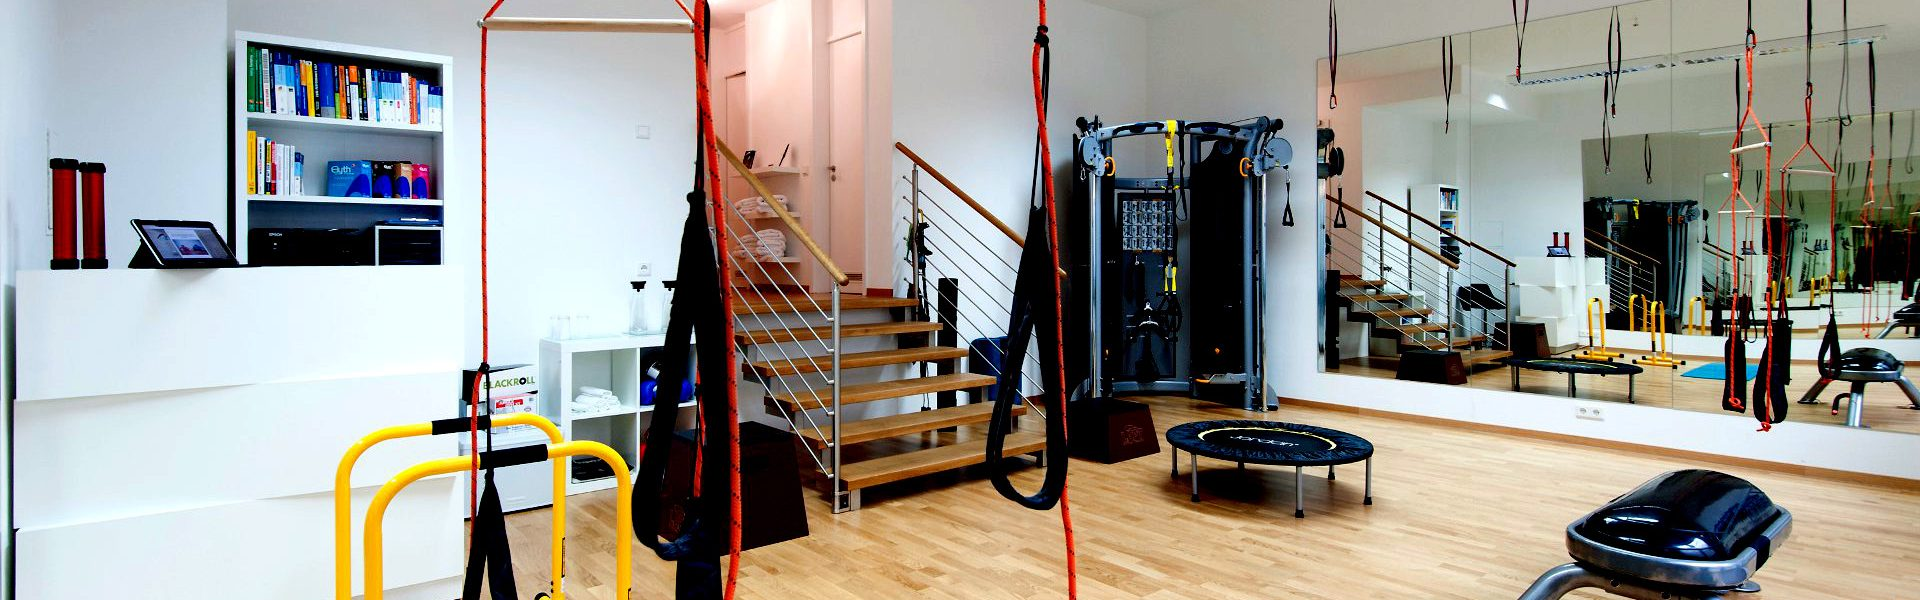 Personal Training Studio Bi PHiT Rumfordstraße - Innenansicht 01